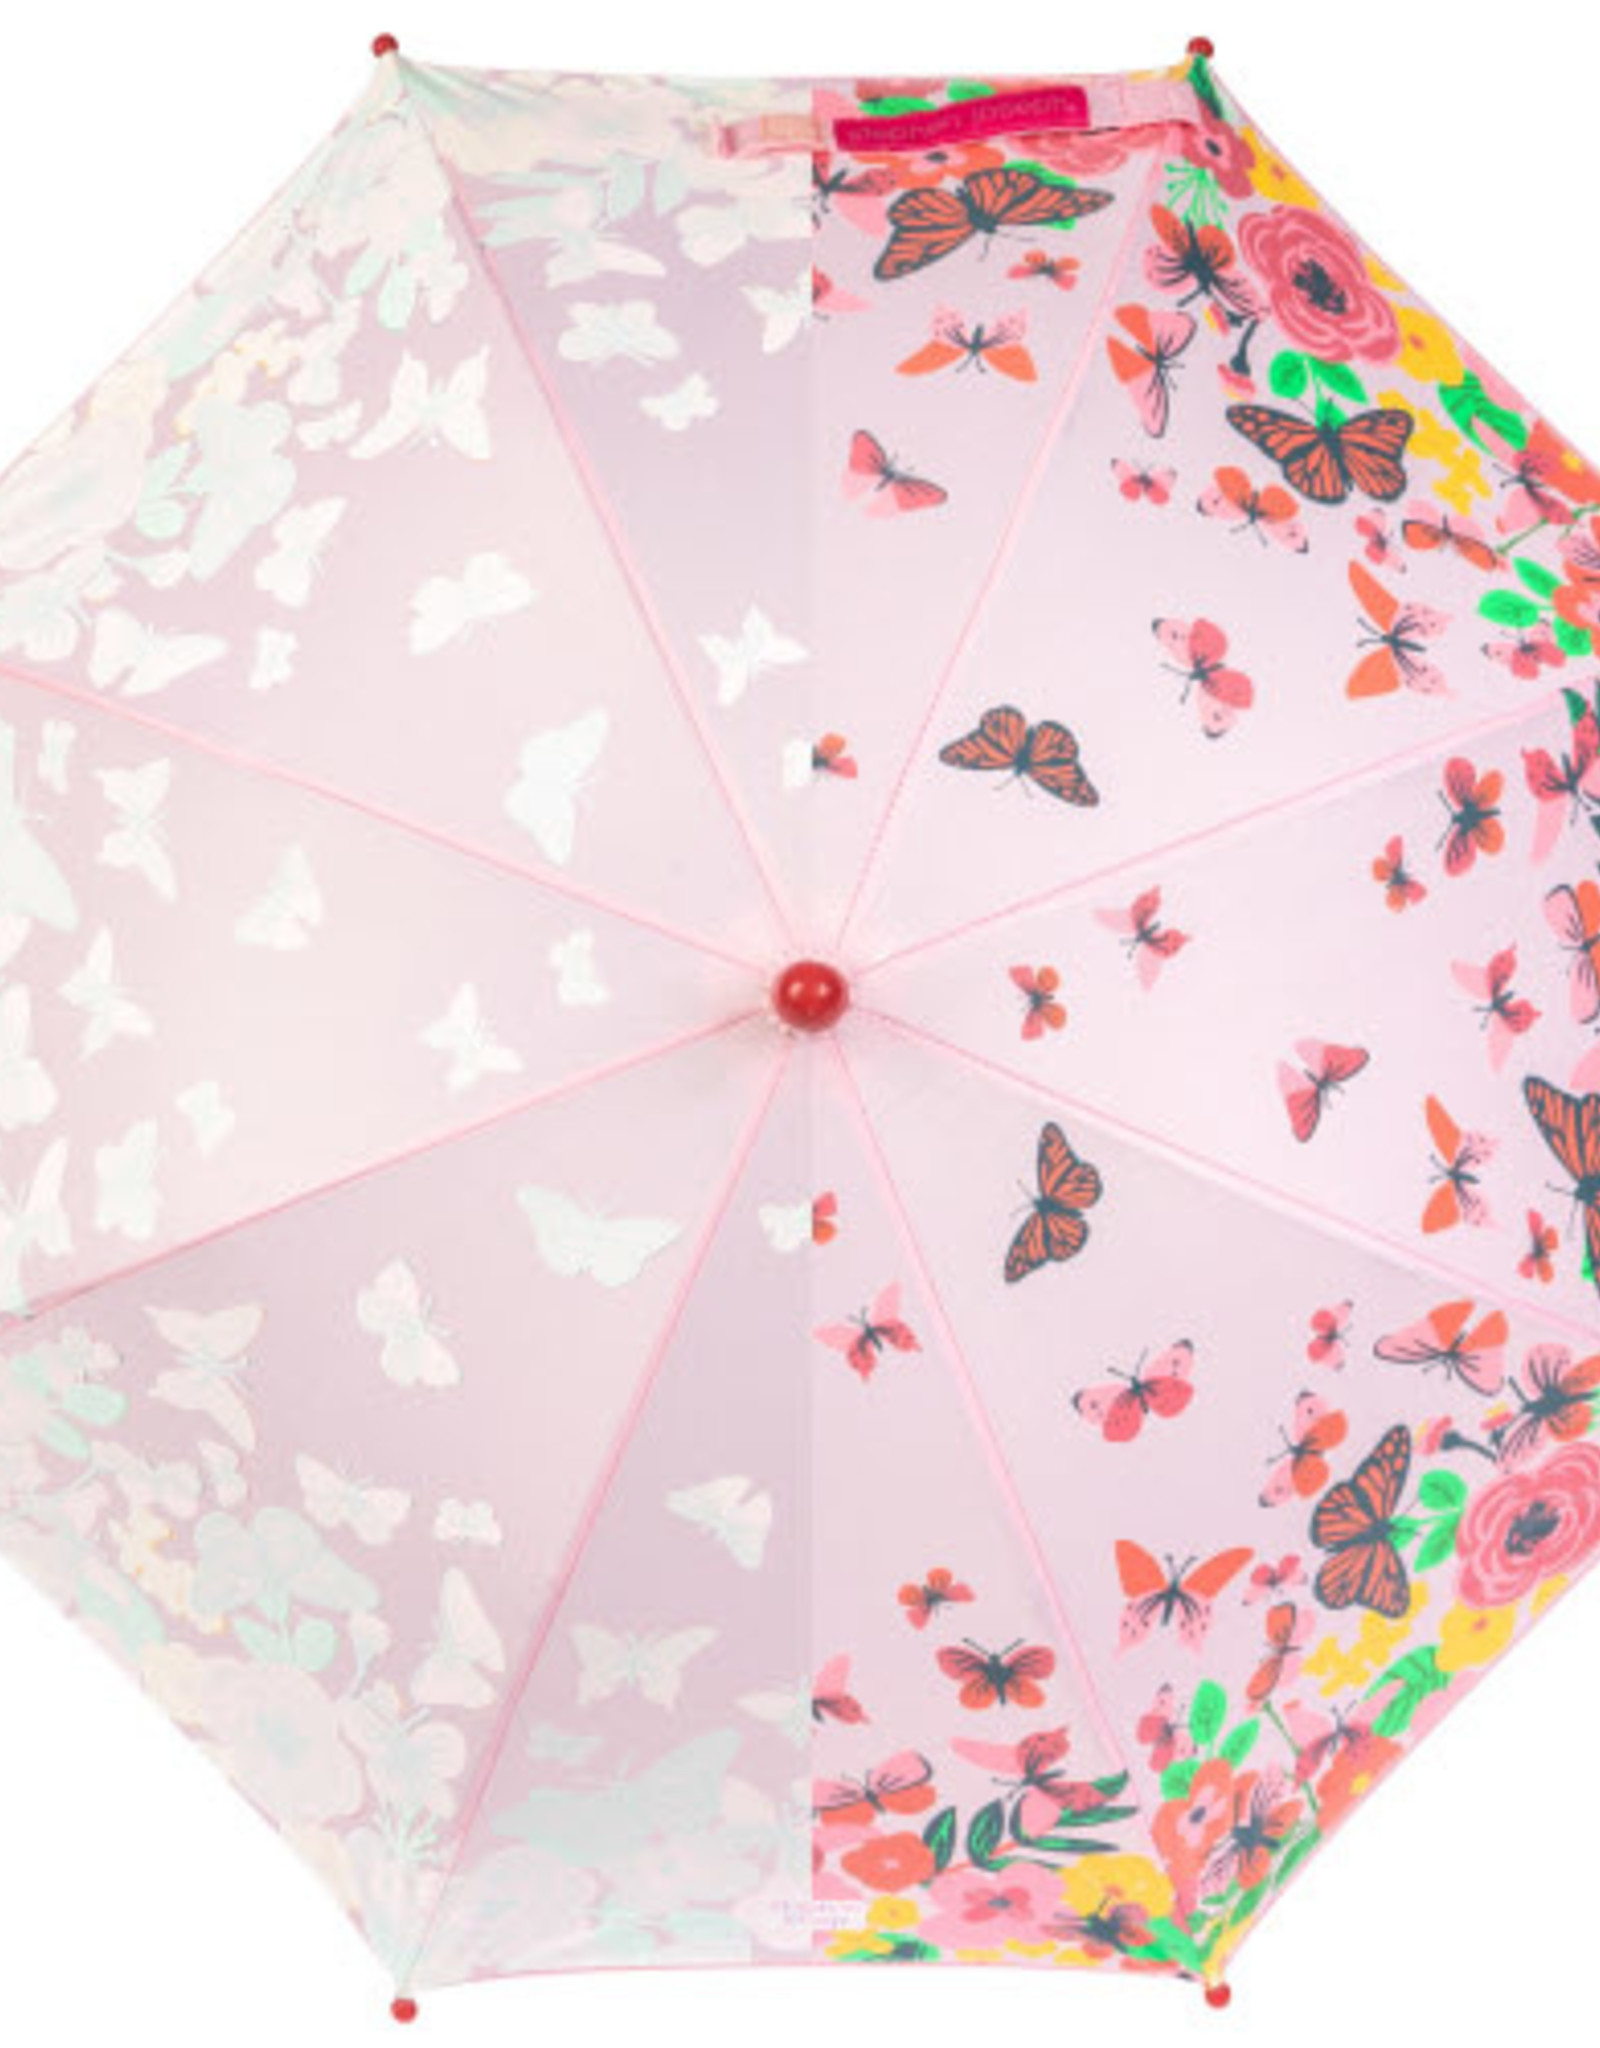 Stephen Joseph Kids colour changing umbrella butterfly